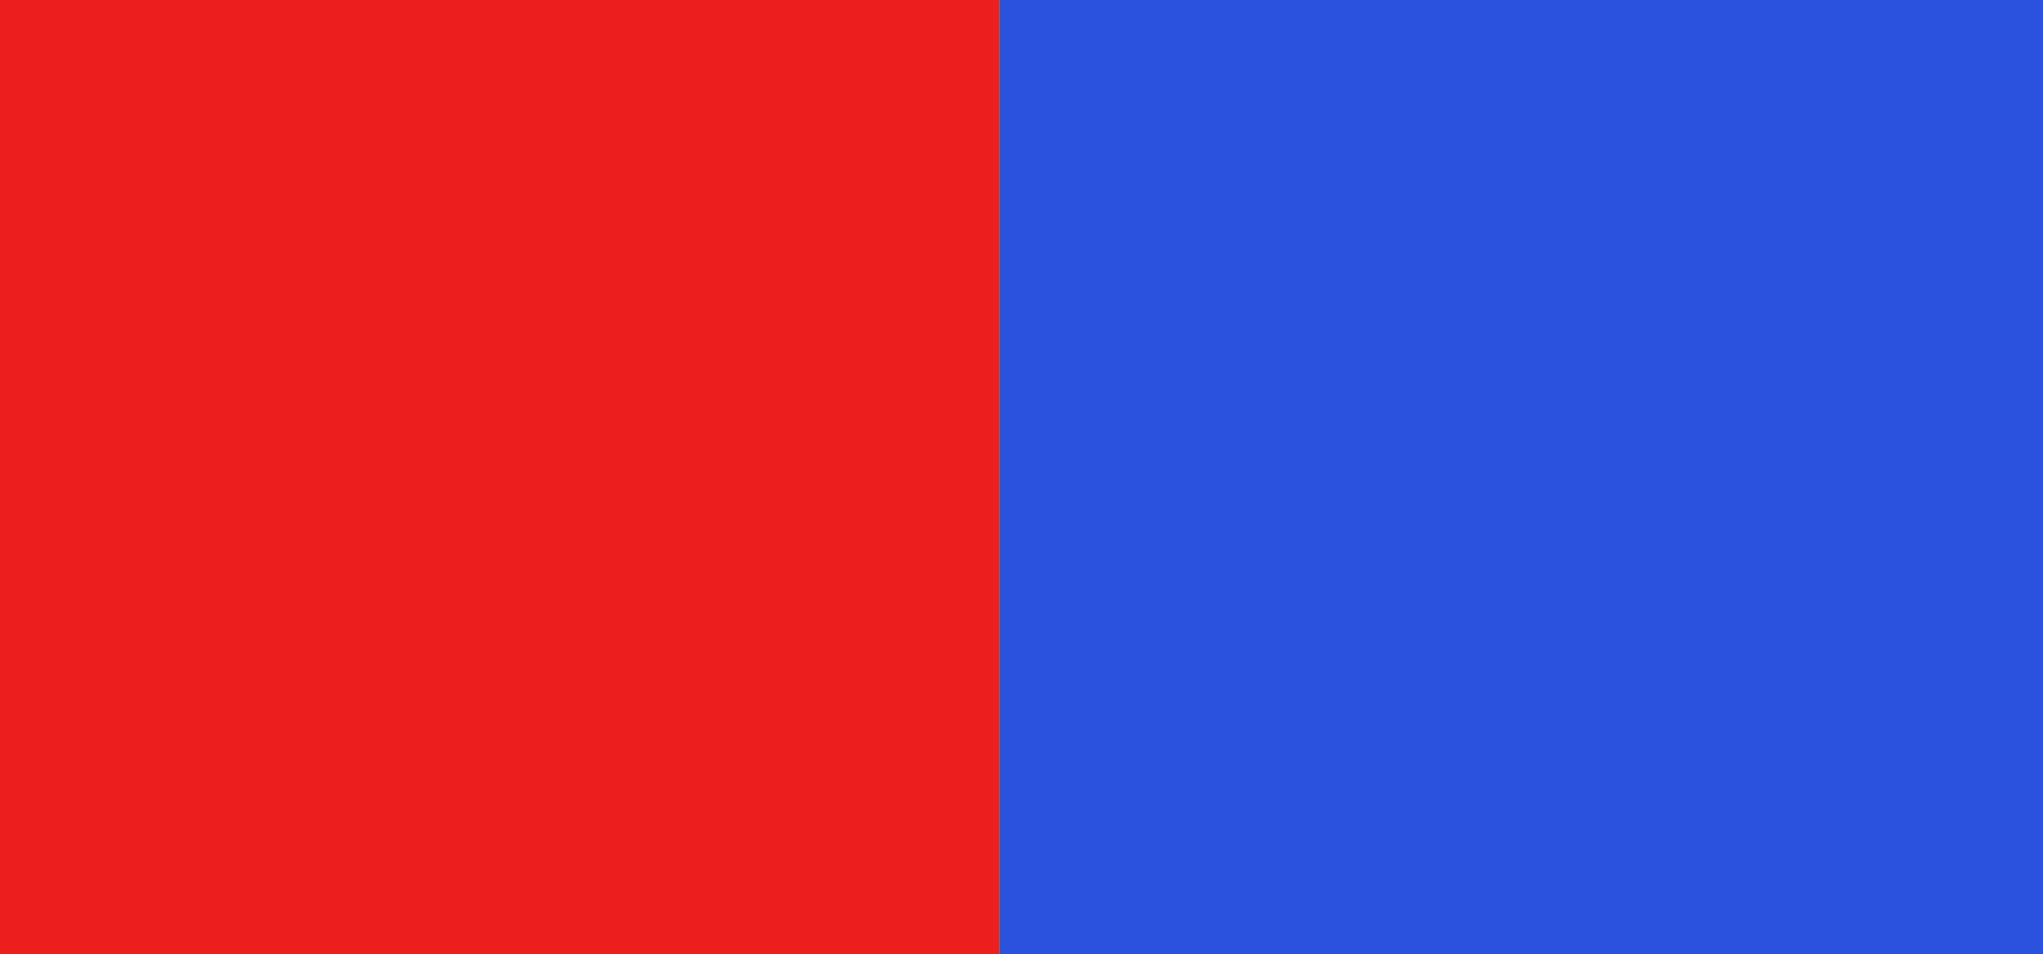 Rouge / bleu